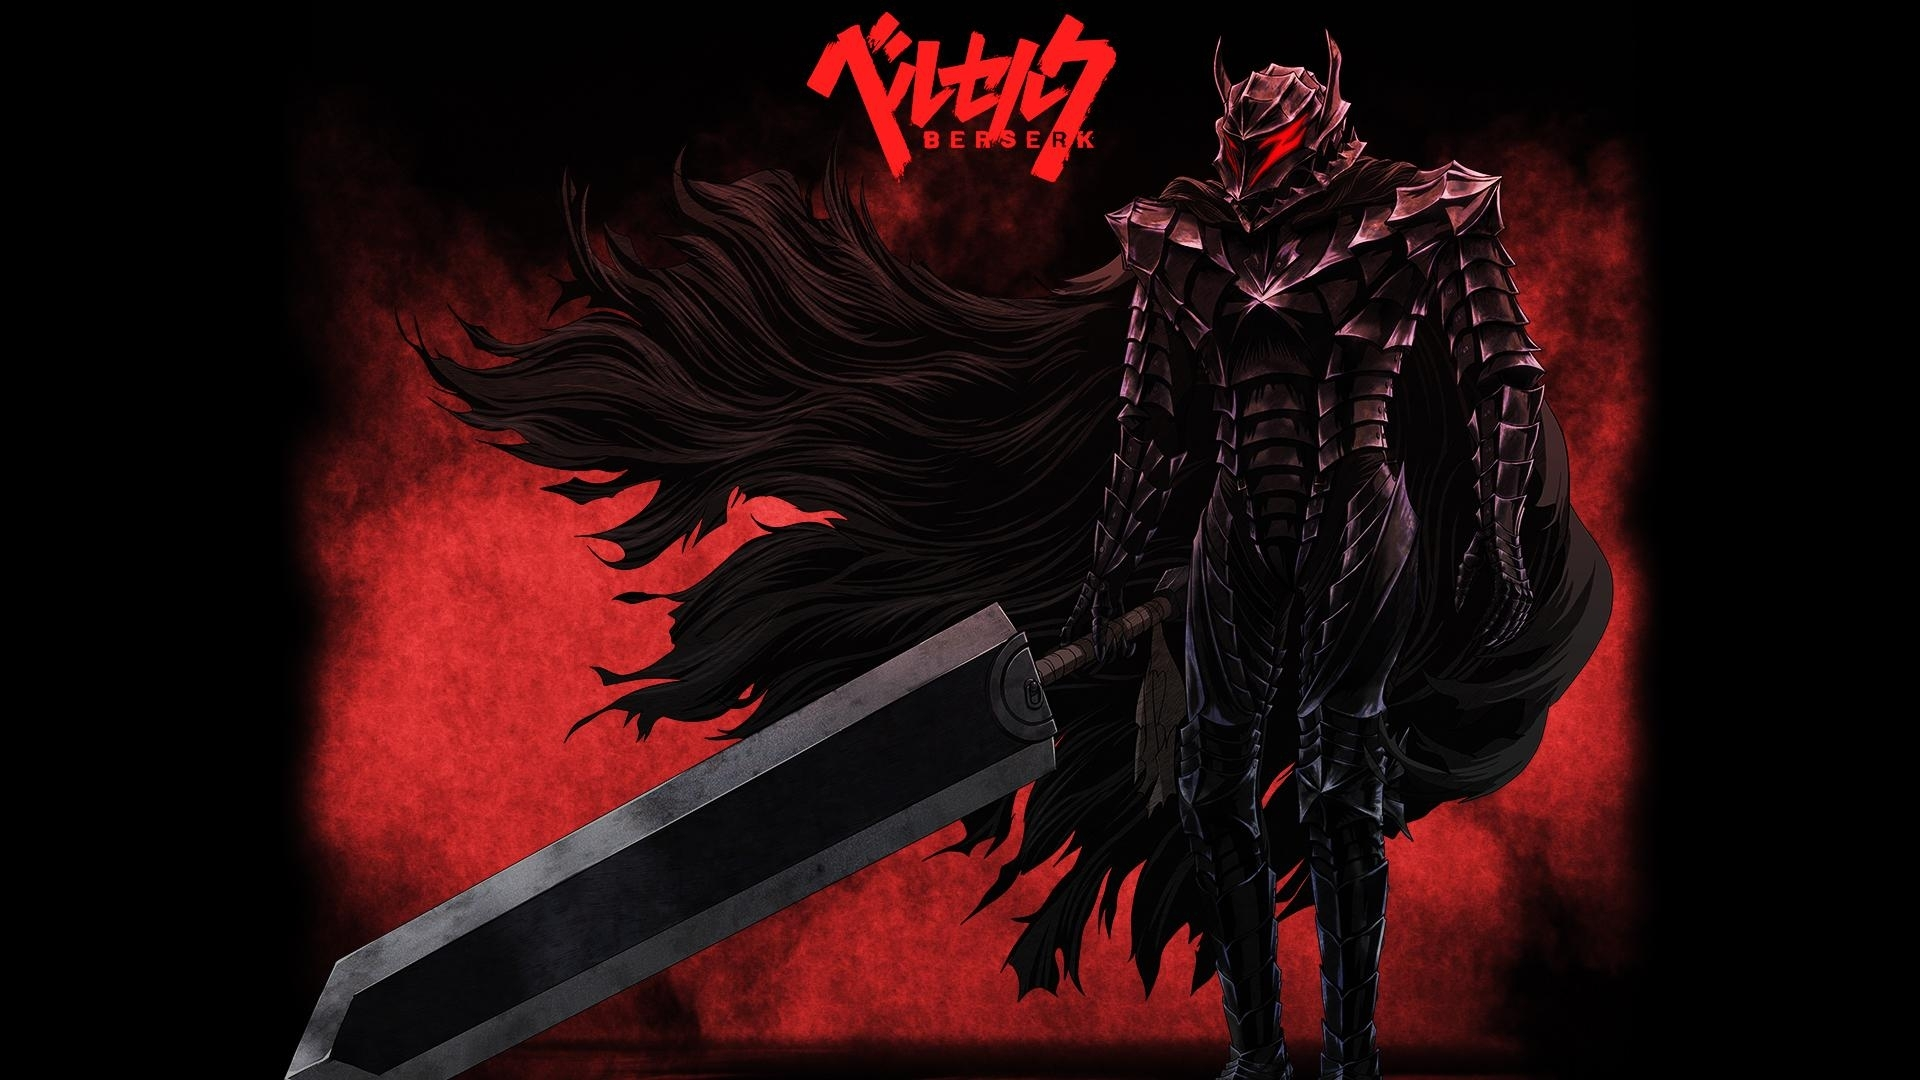 berserk 2017 berserker armor wallpaper 1920x1080 (fixed link) : berserk